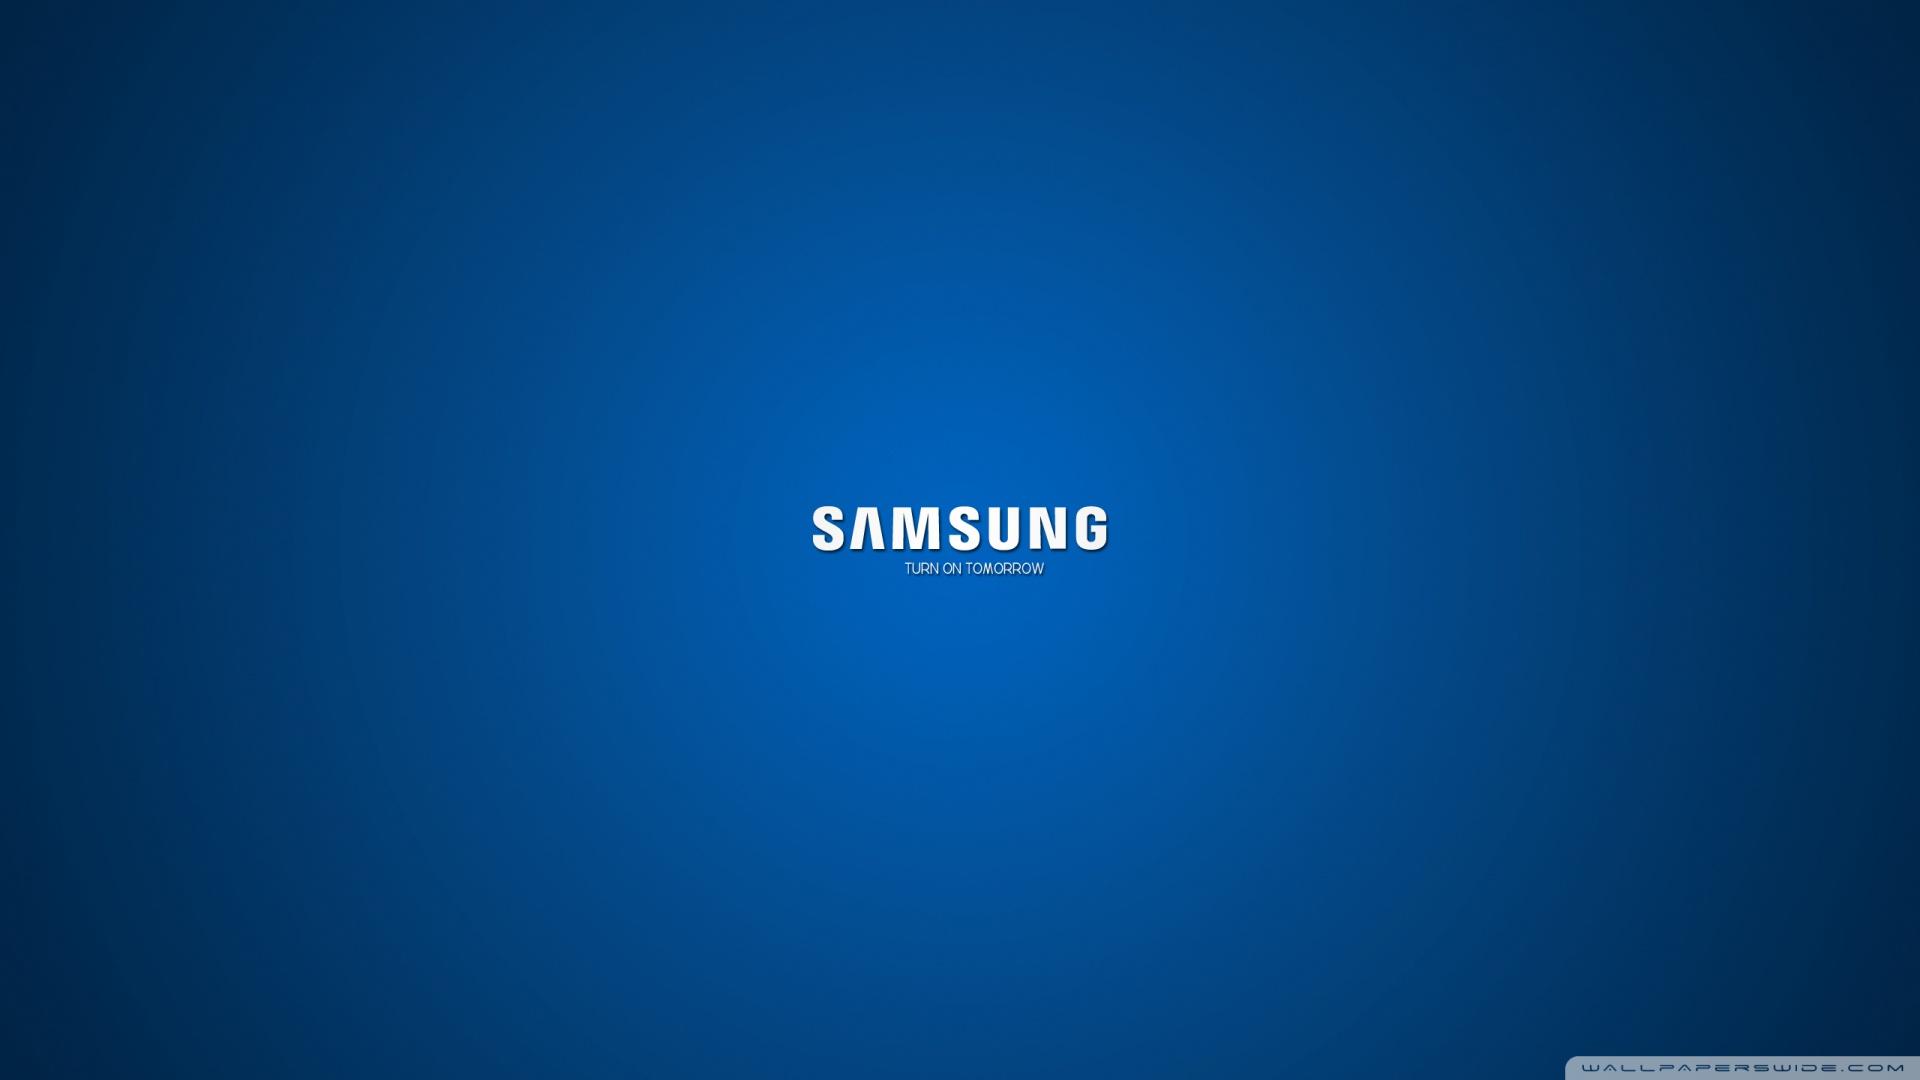 Samsung Turn On Tomorrow Wallpaper 1920x1080 Samsung Turn On 1920x1080